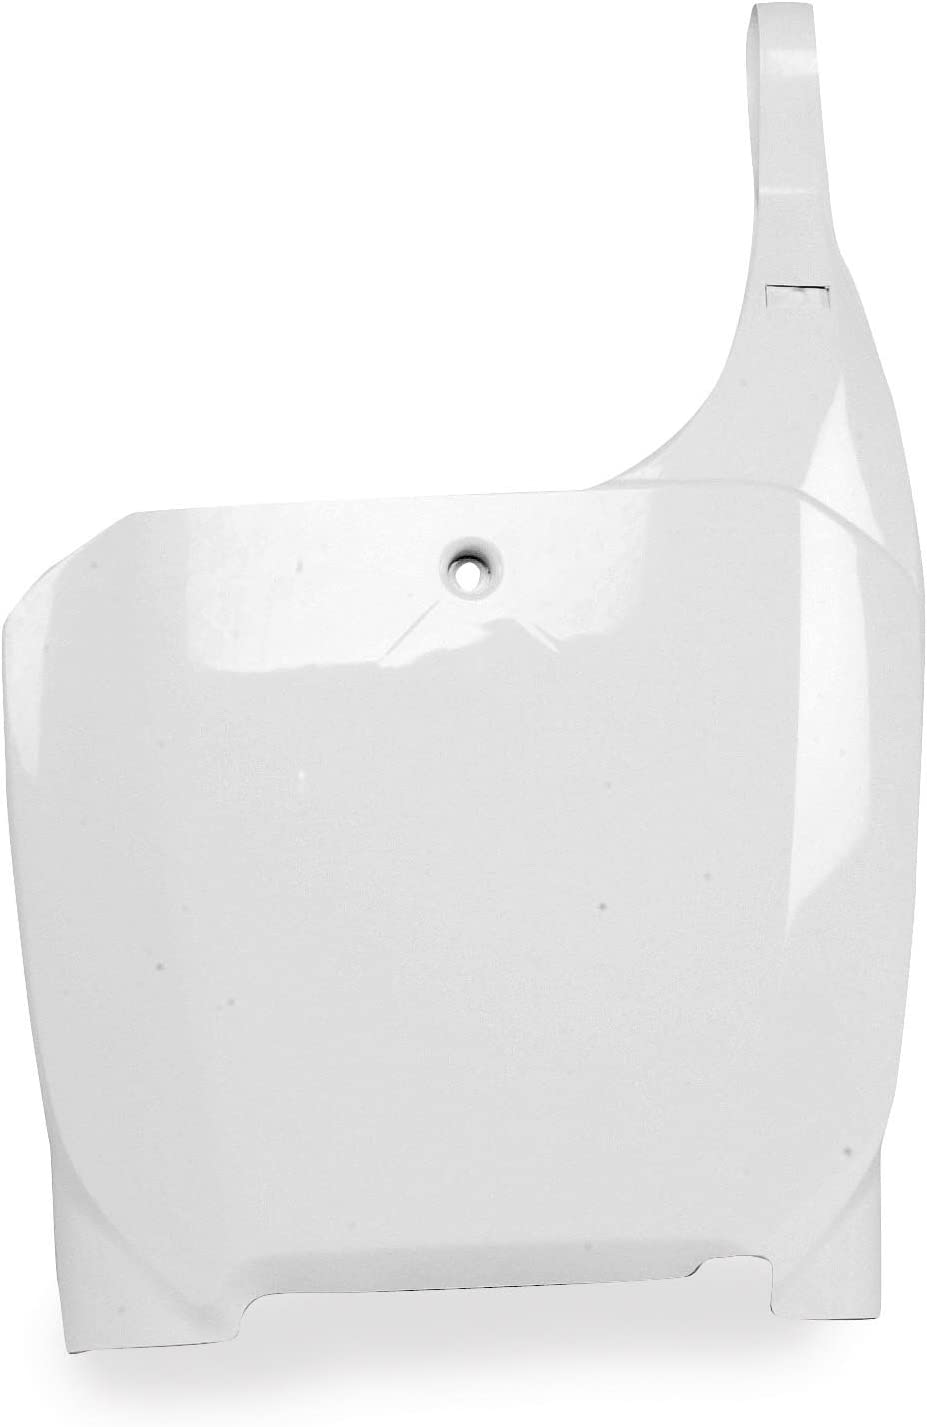 ACERBIS NUMBER PLATE WHITE HONDA CR85 2003-2007